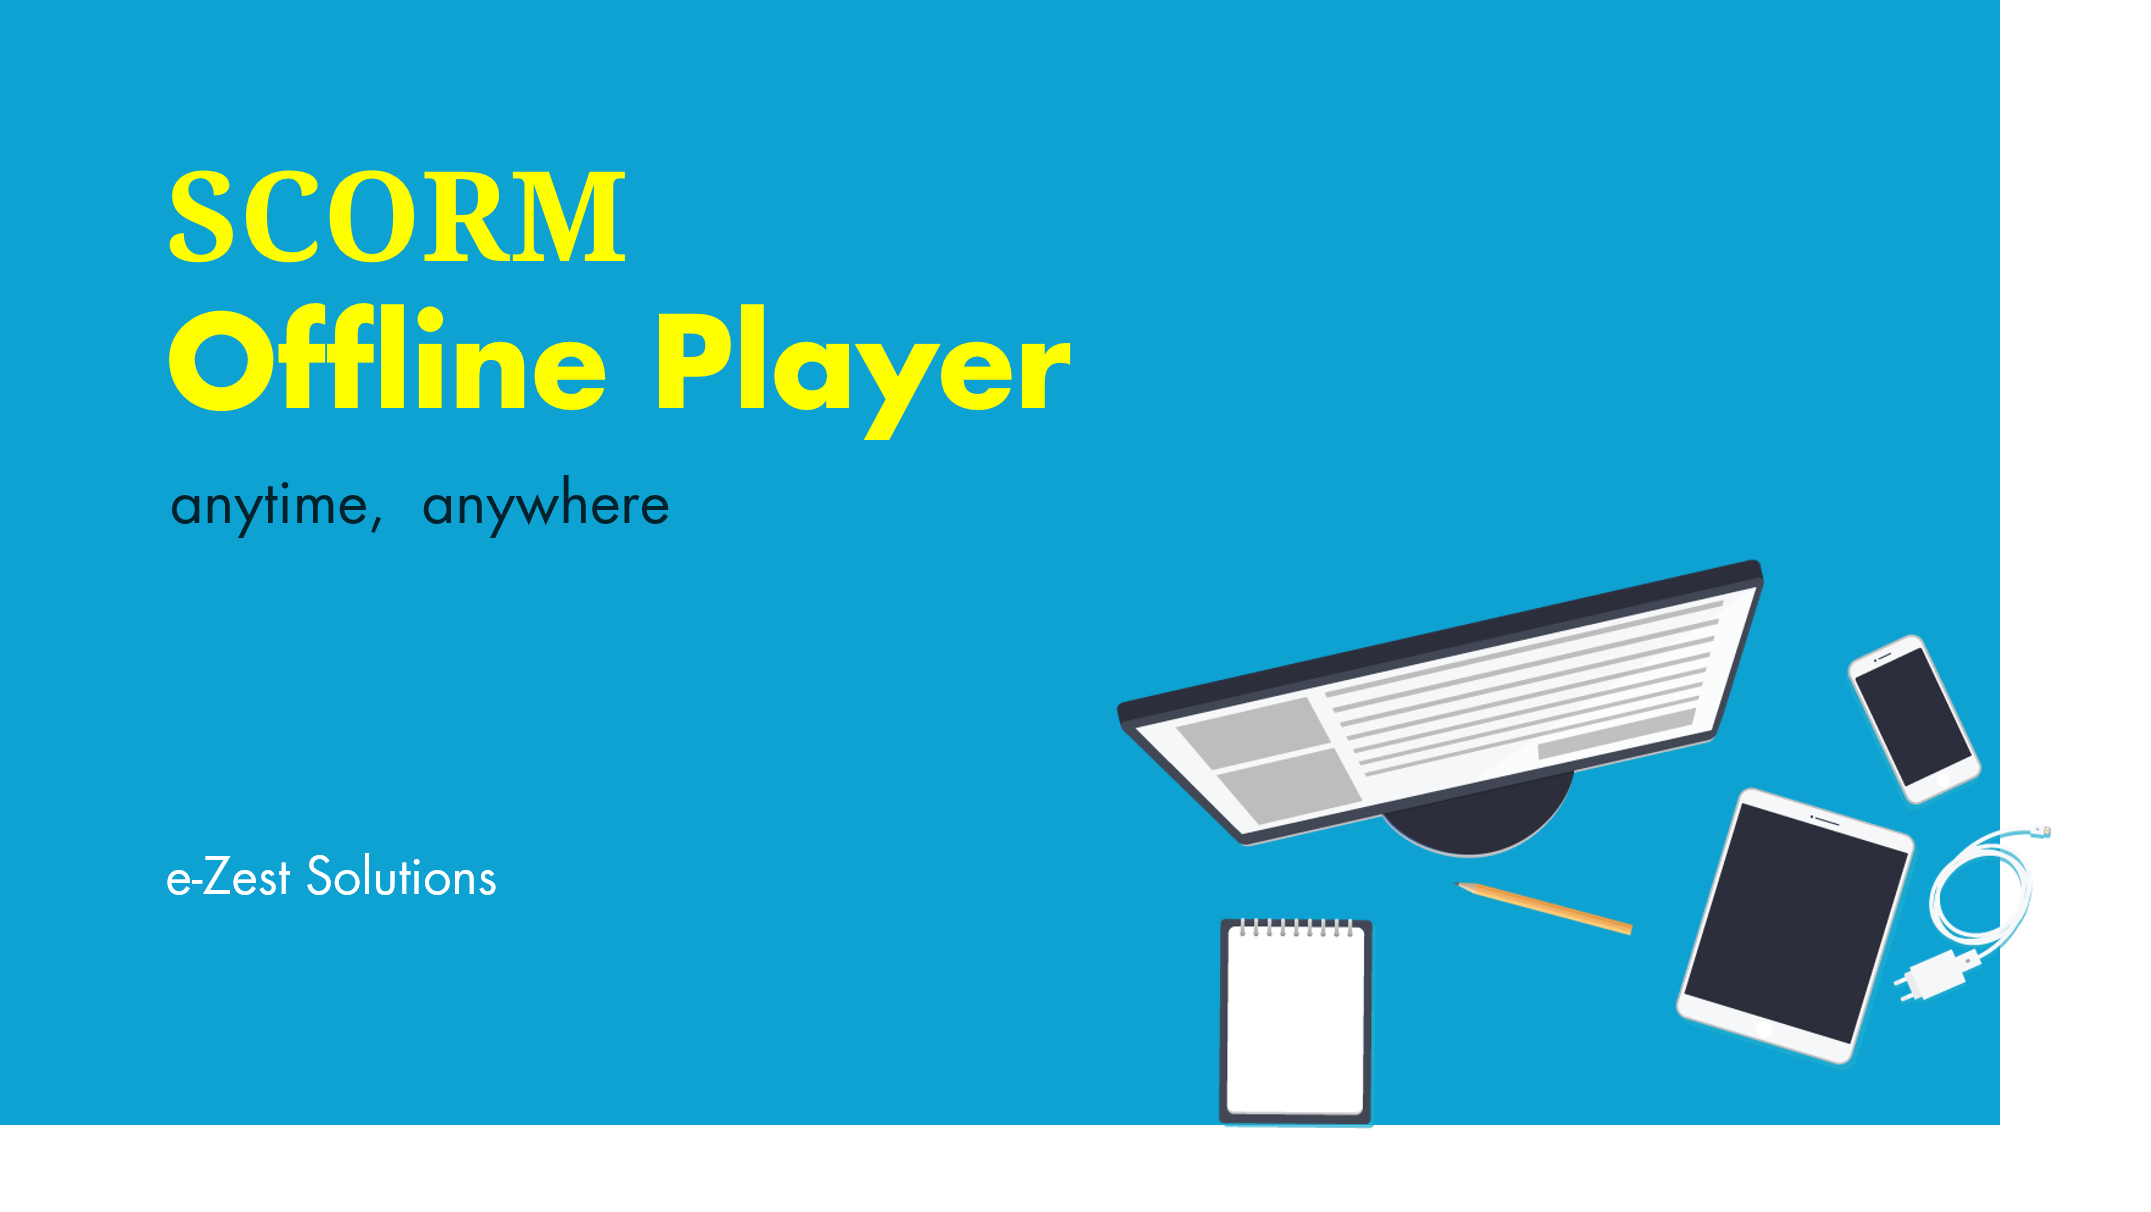 SCORM Offline Player for Mobile